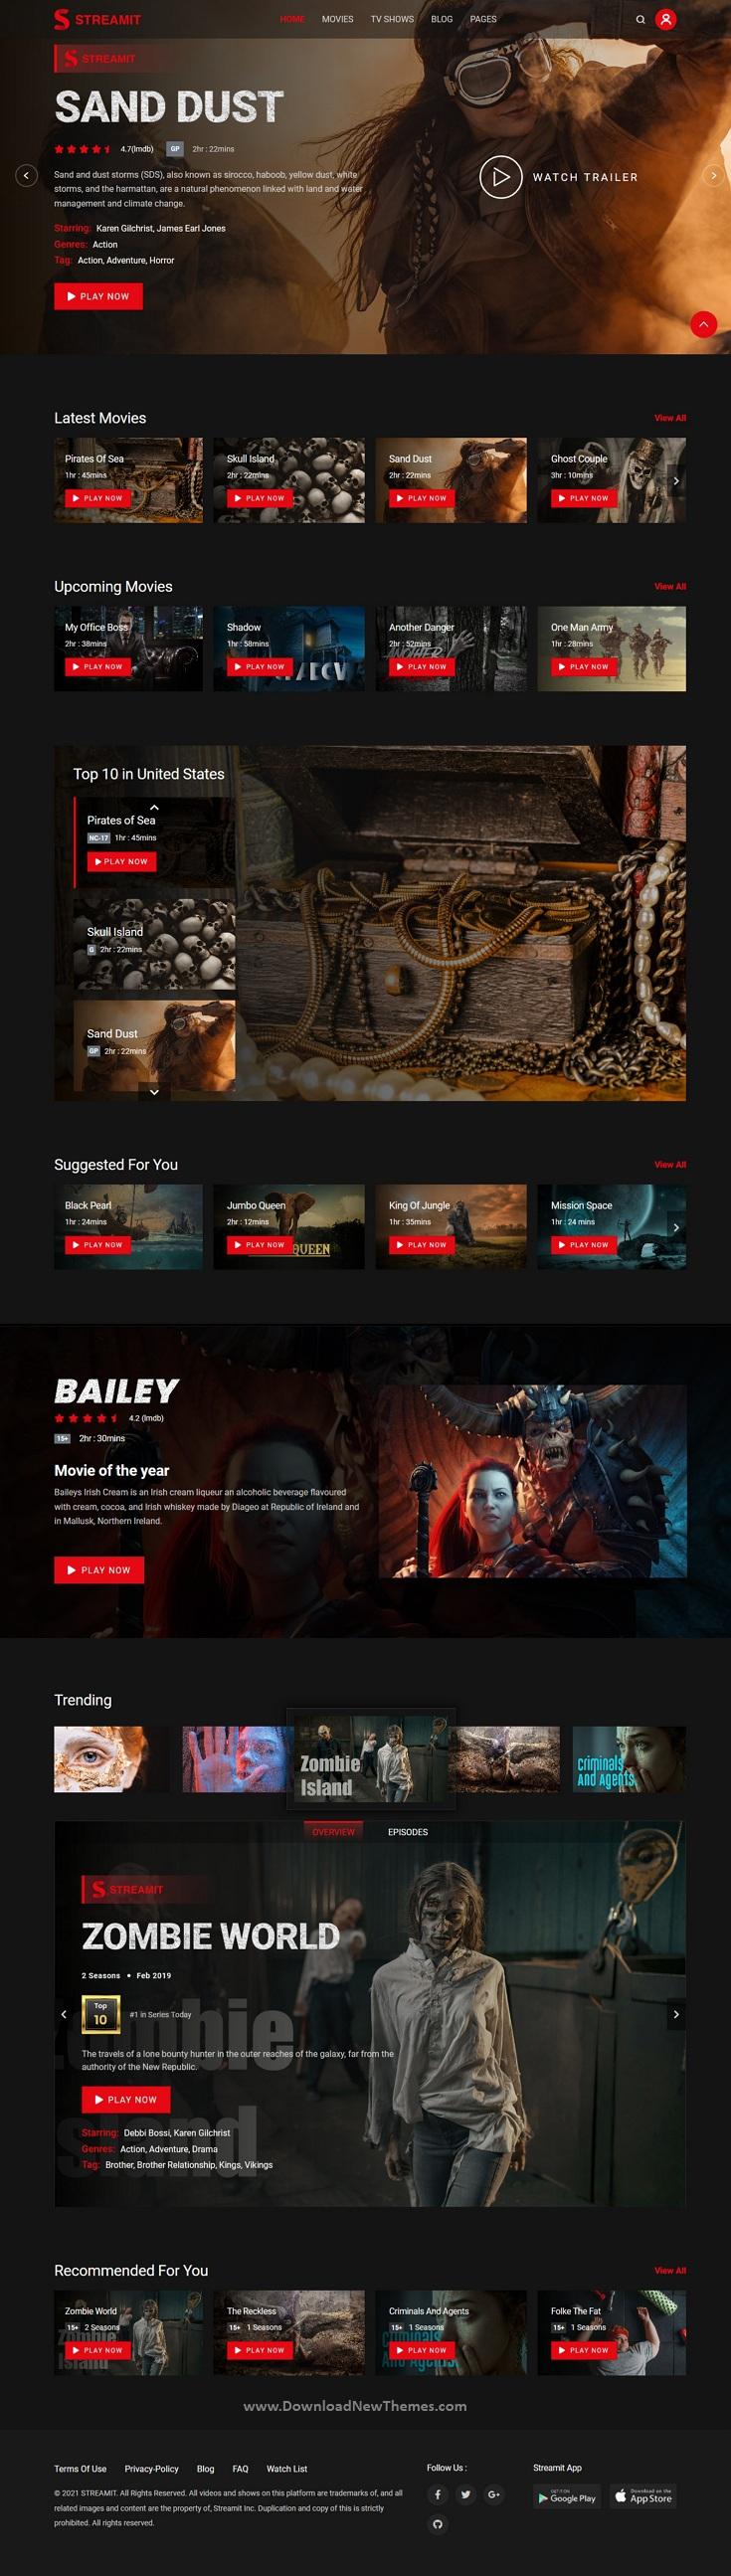 Video Streaming Premium WordPress Theme